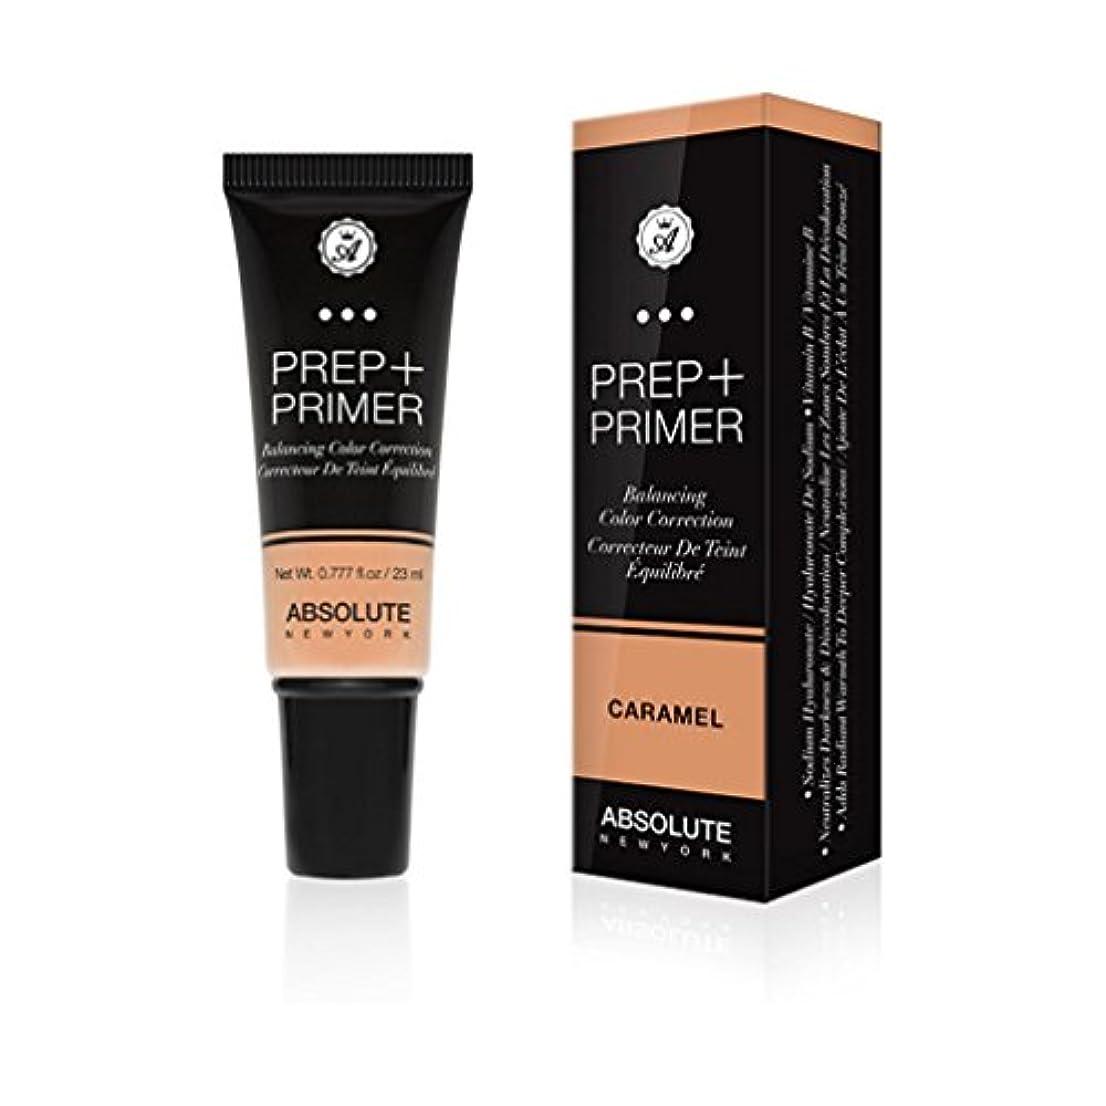 不毛奇妙な幾何学(3 Pack) ABSOLUTE Prep + Primer - Caramel (並行輸入品)